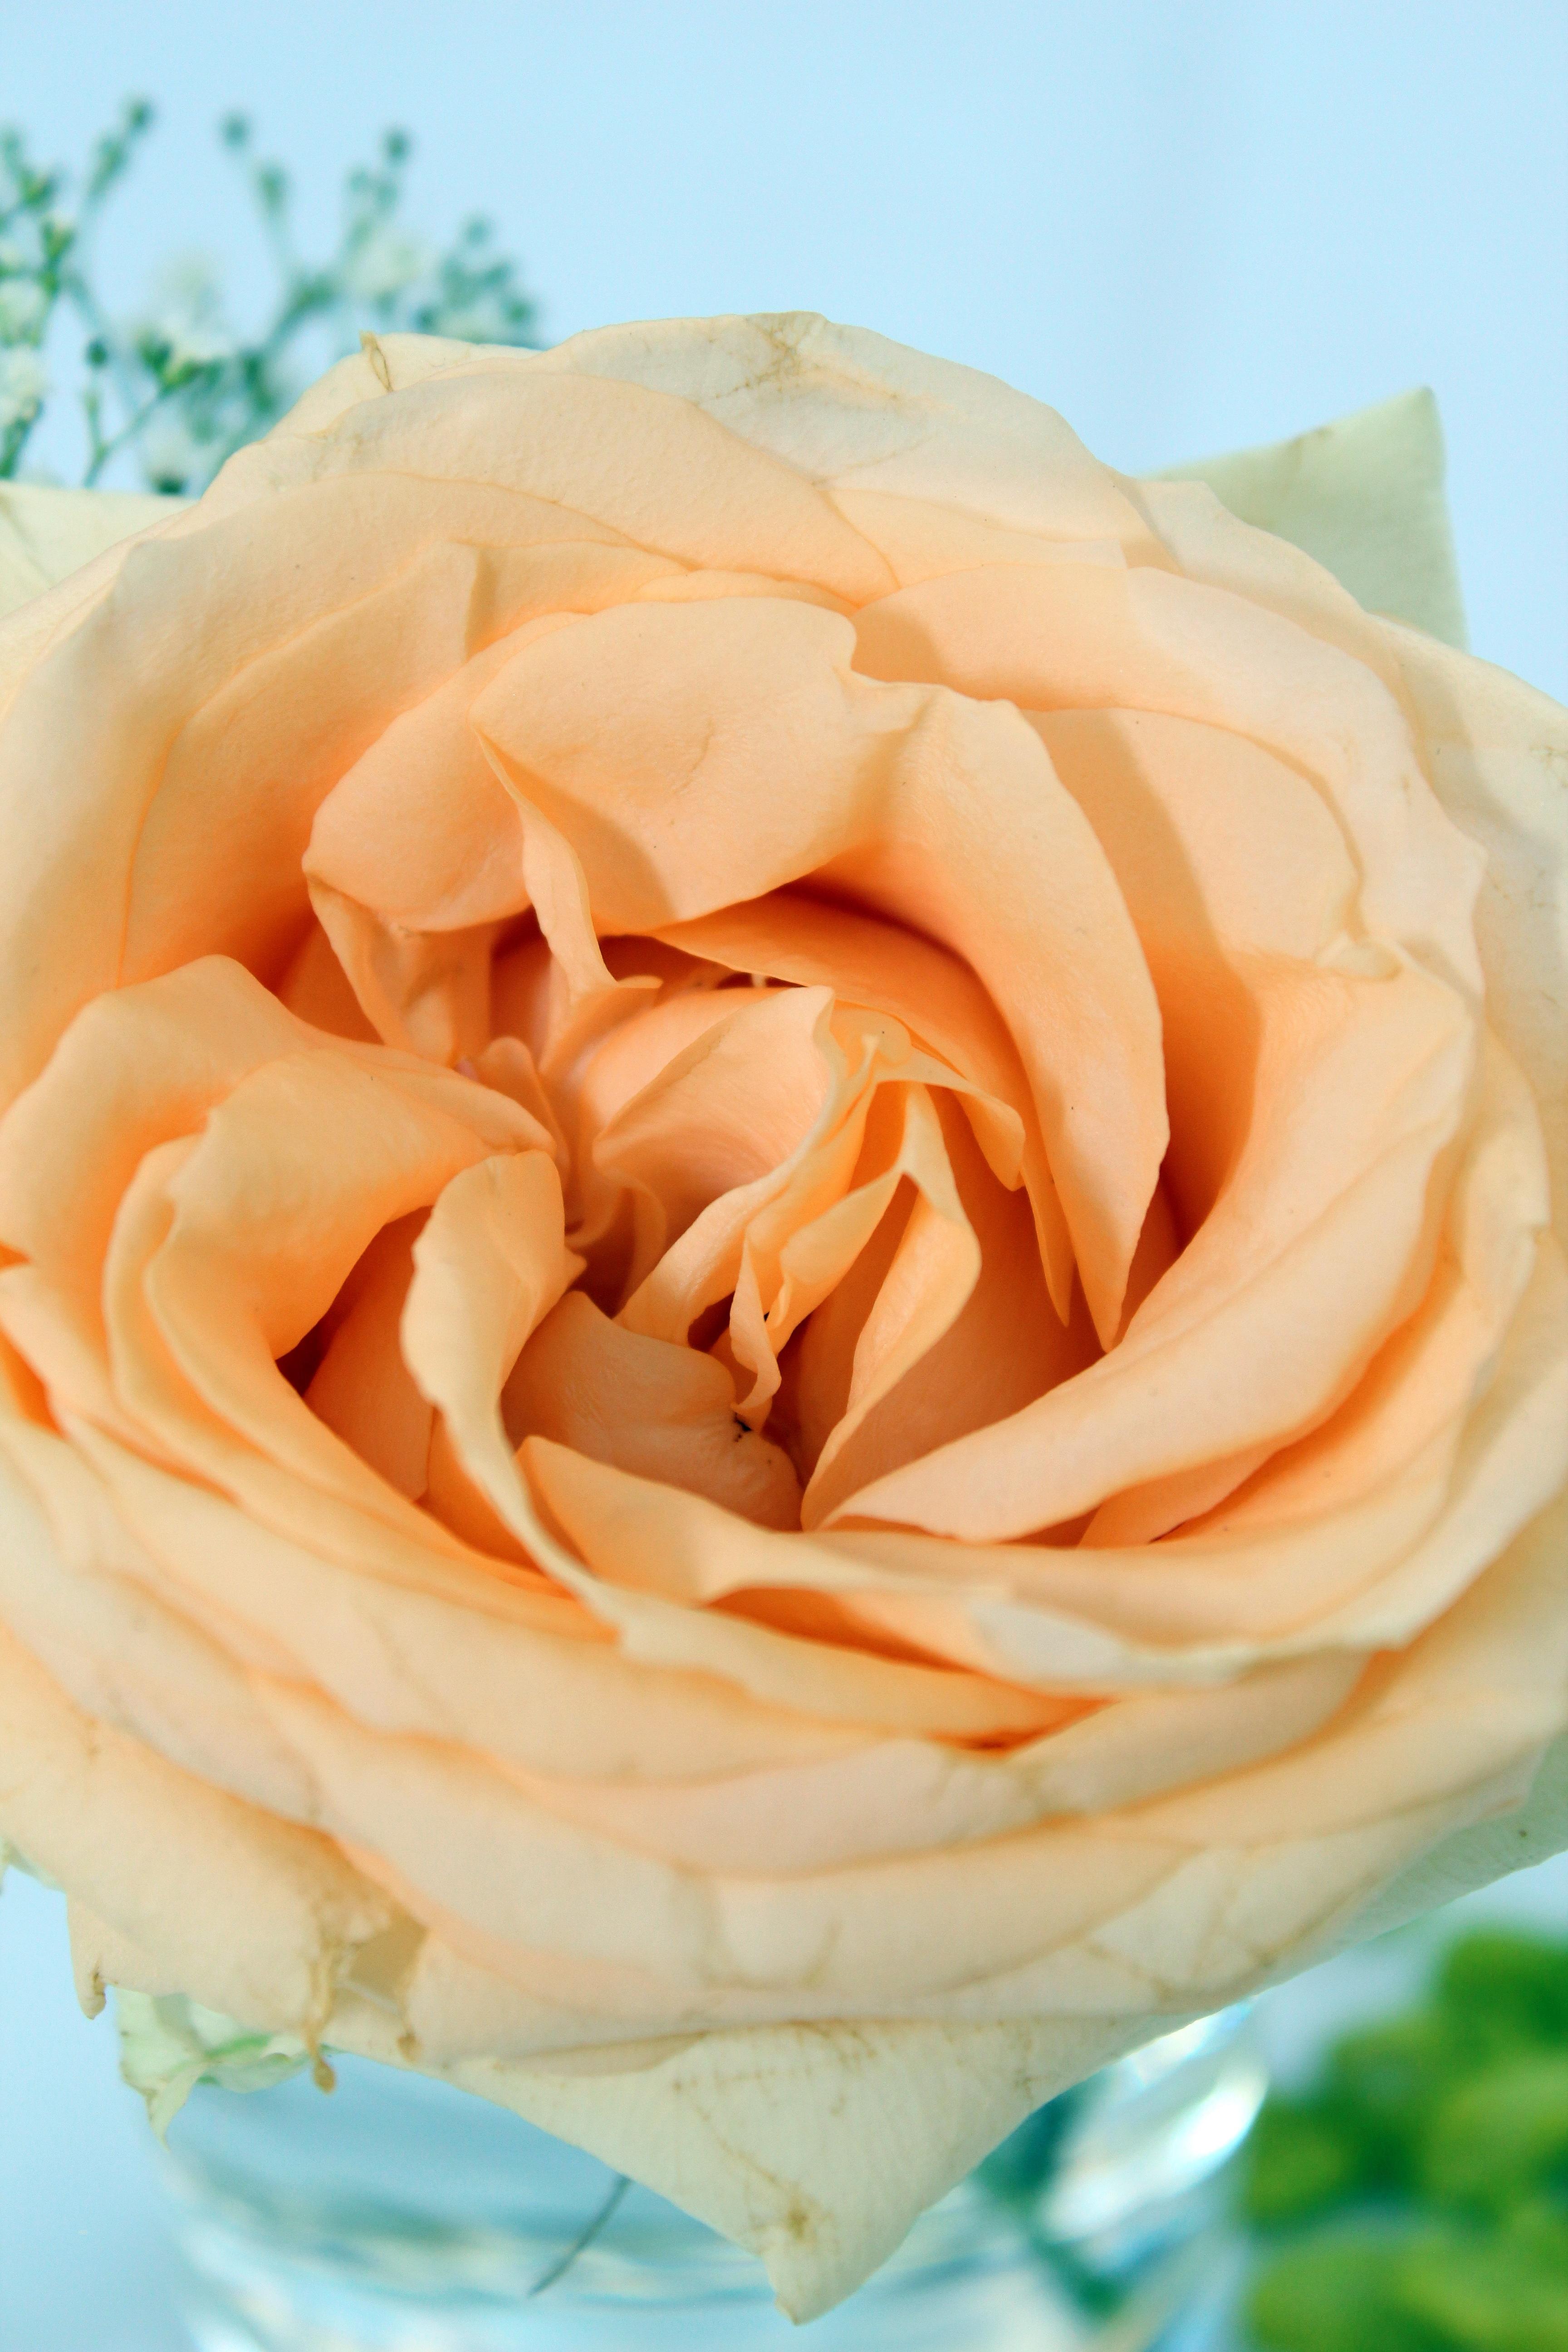 Free Images Petal Orange Food Yellow Pink Flowers Close Up